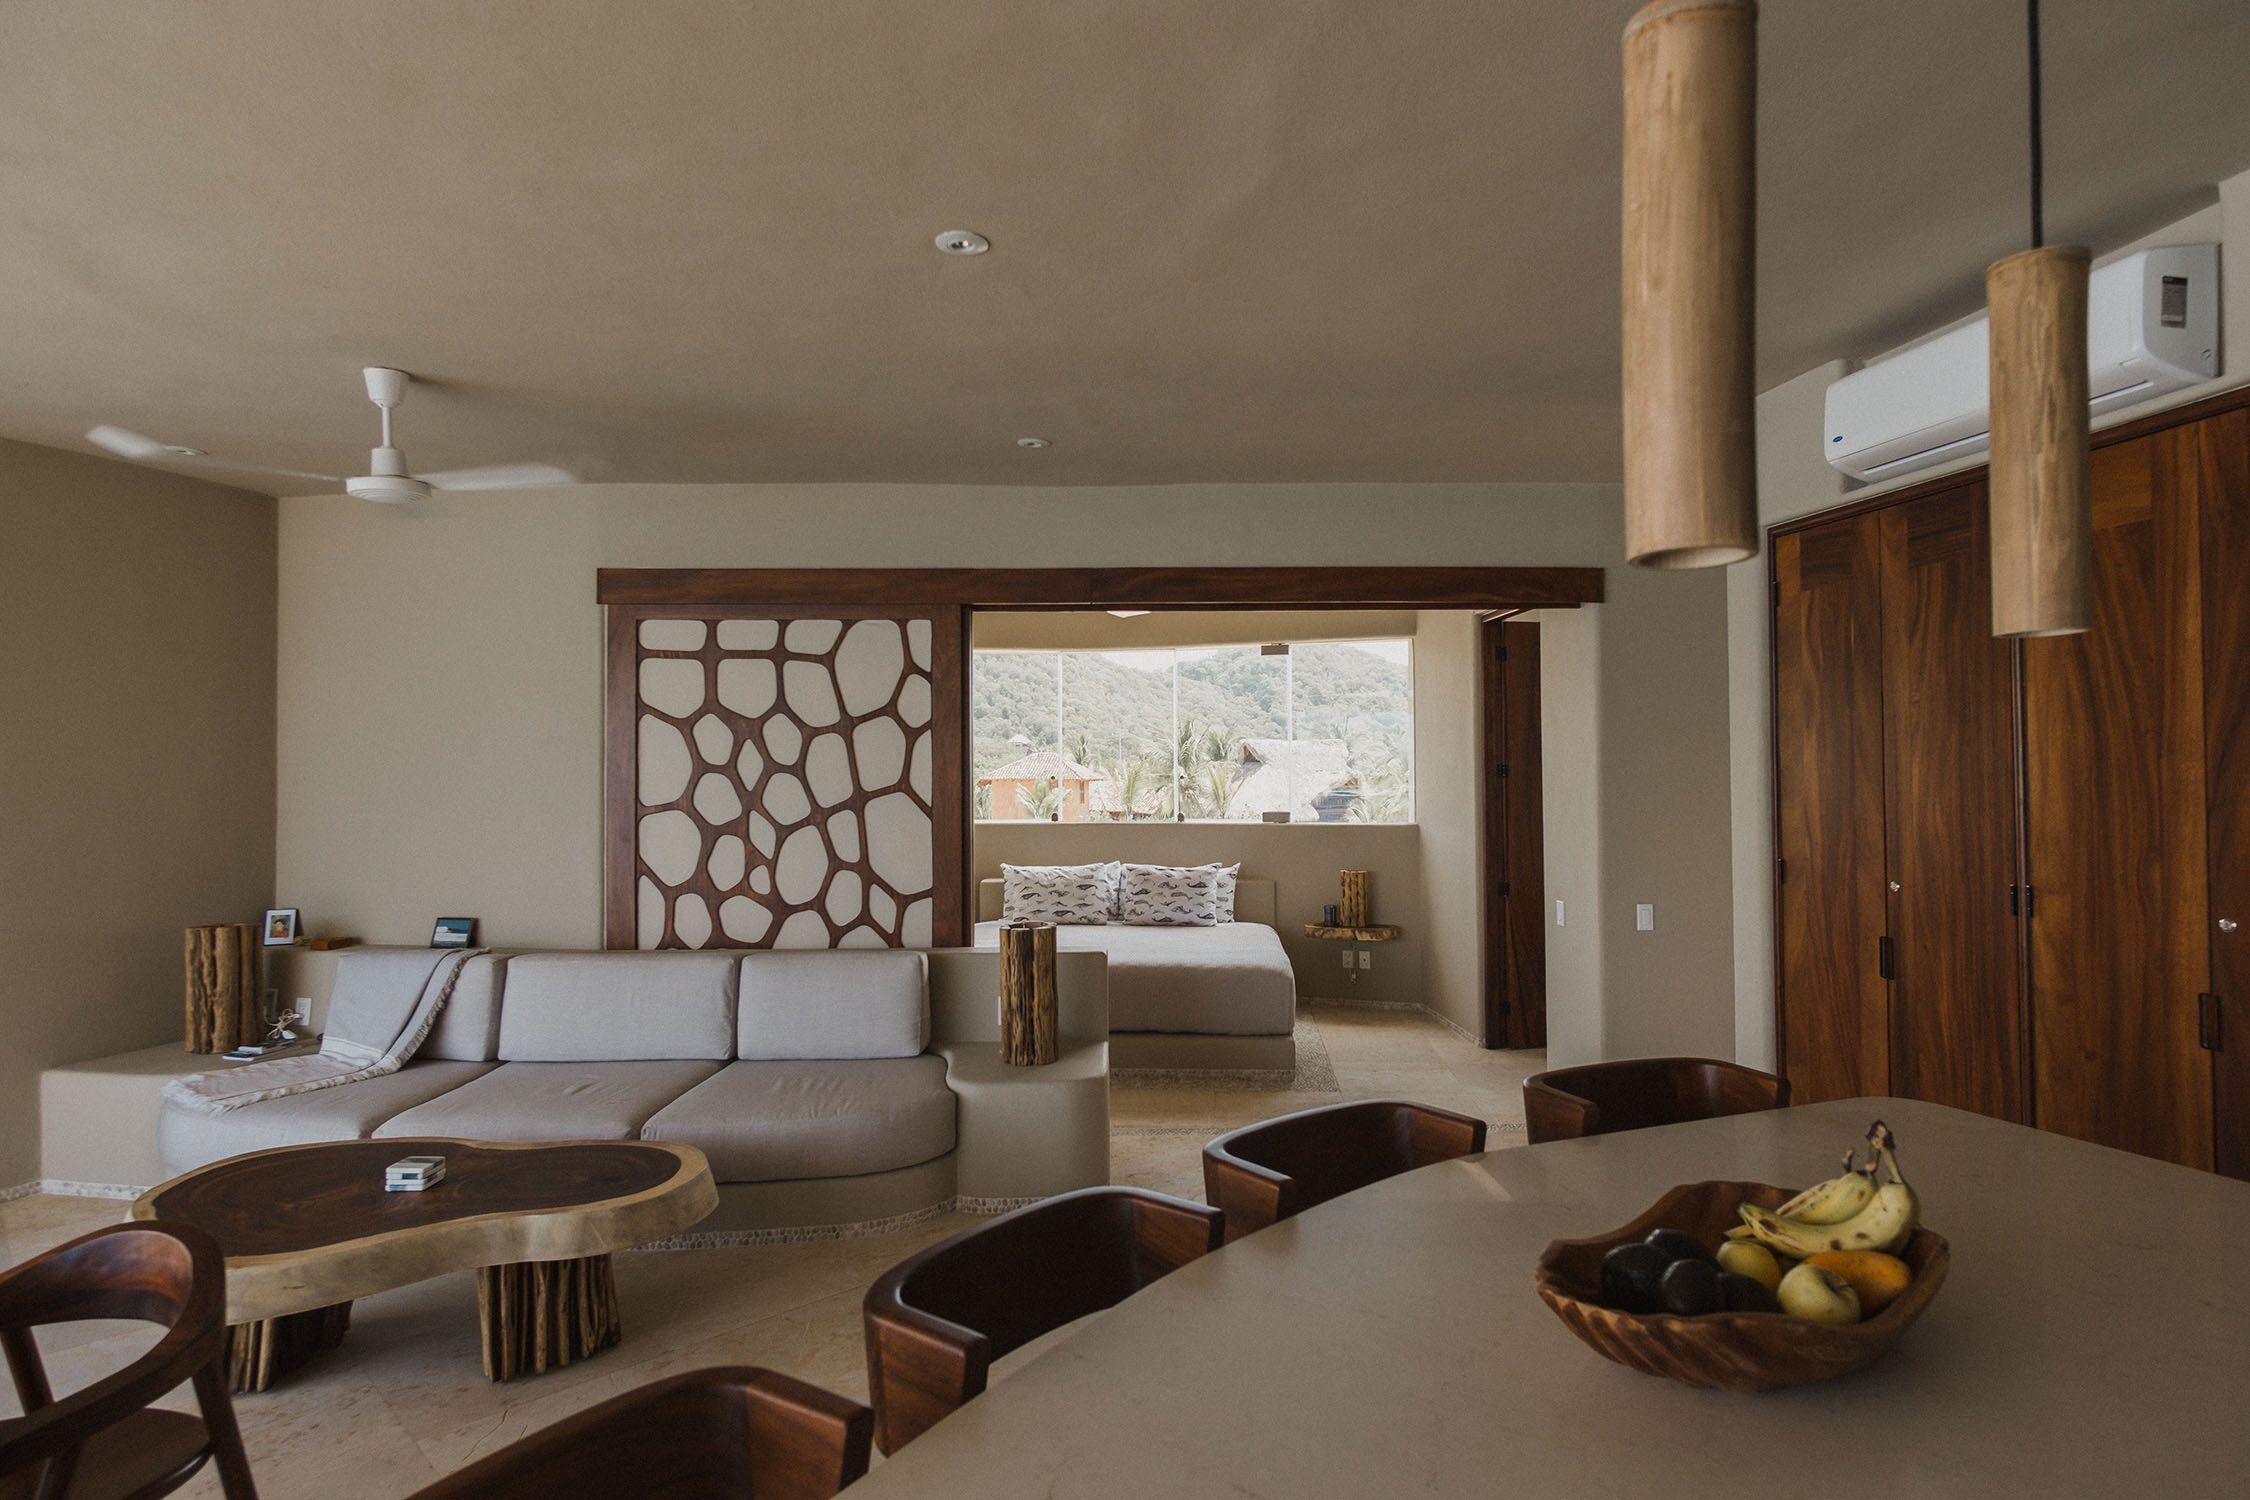 Punta-Majahua-Troncones-Ixtapa-Zihuatanejo-Zozaya-Arquitectos-Fotografia-Heiko-Bothe-17.jpg